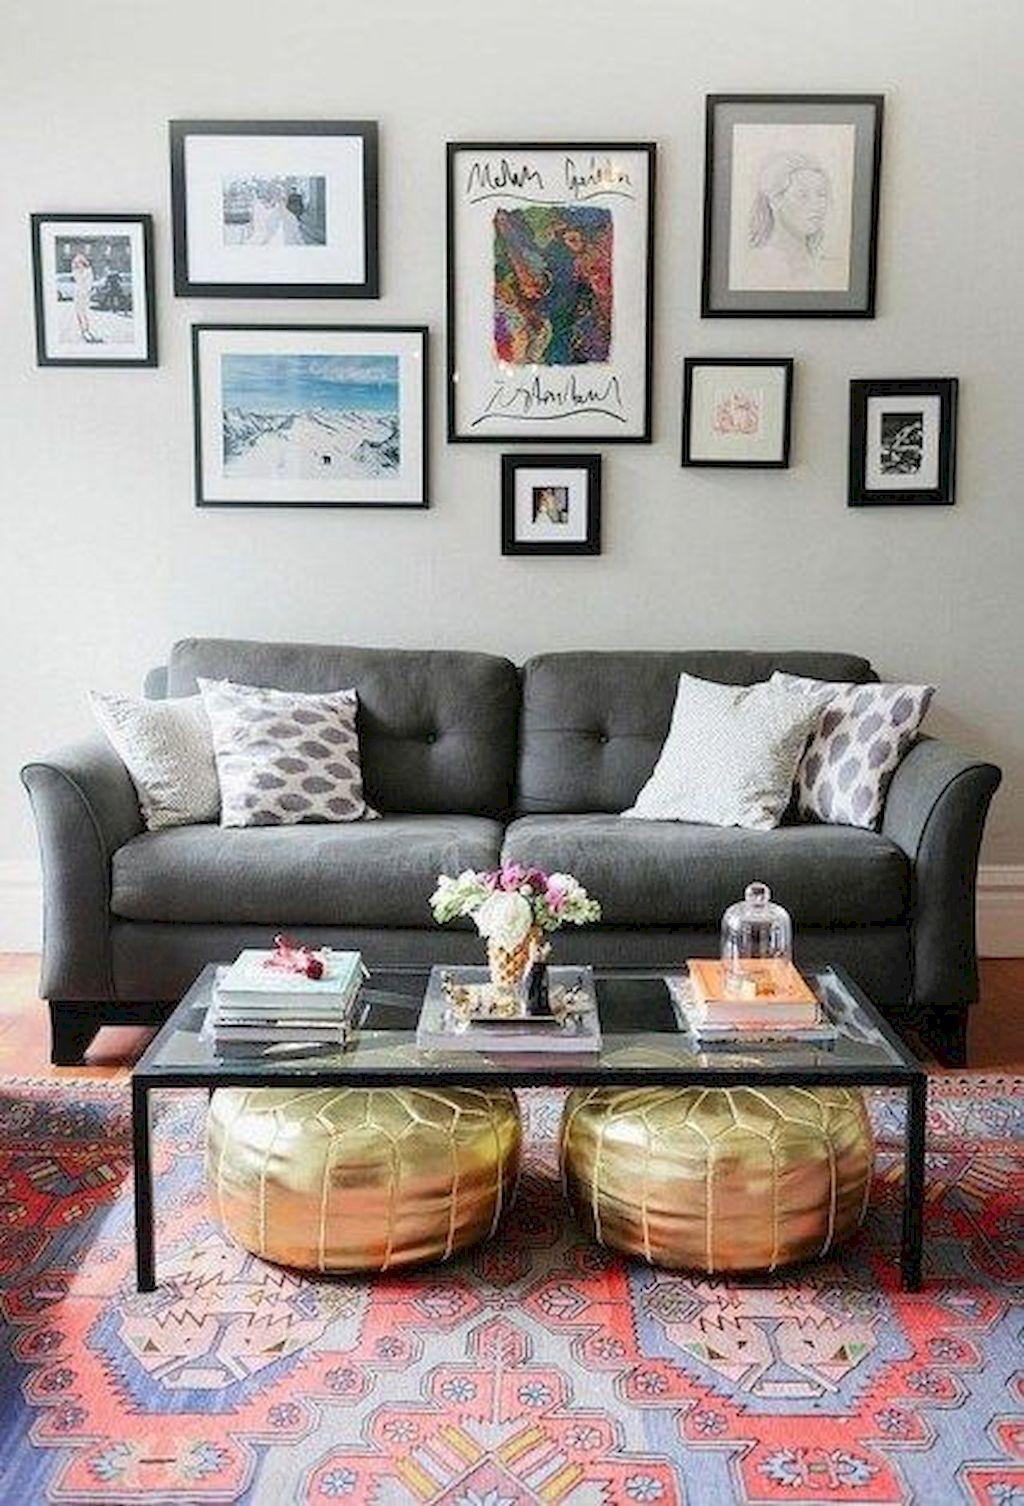 Cheap Living Room Decorating Ideas: 55 Cheap Apartment Decorating Ideas